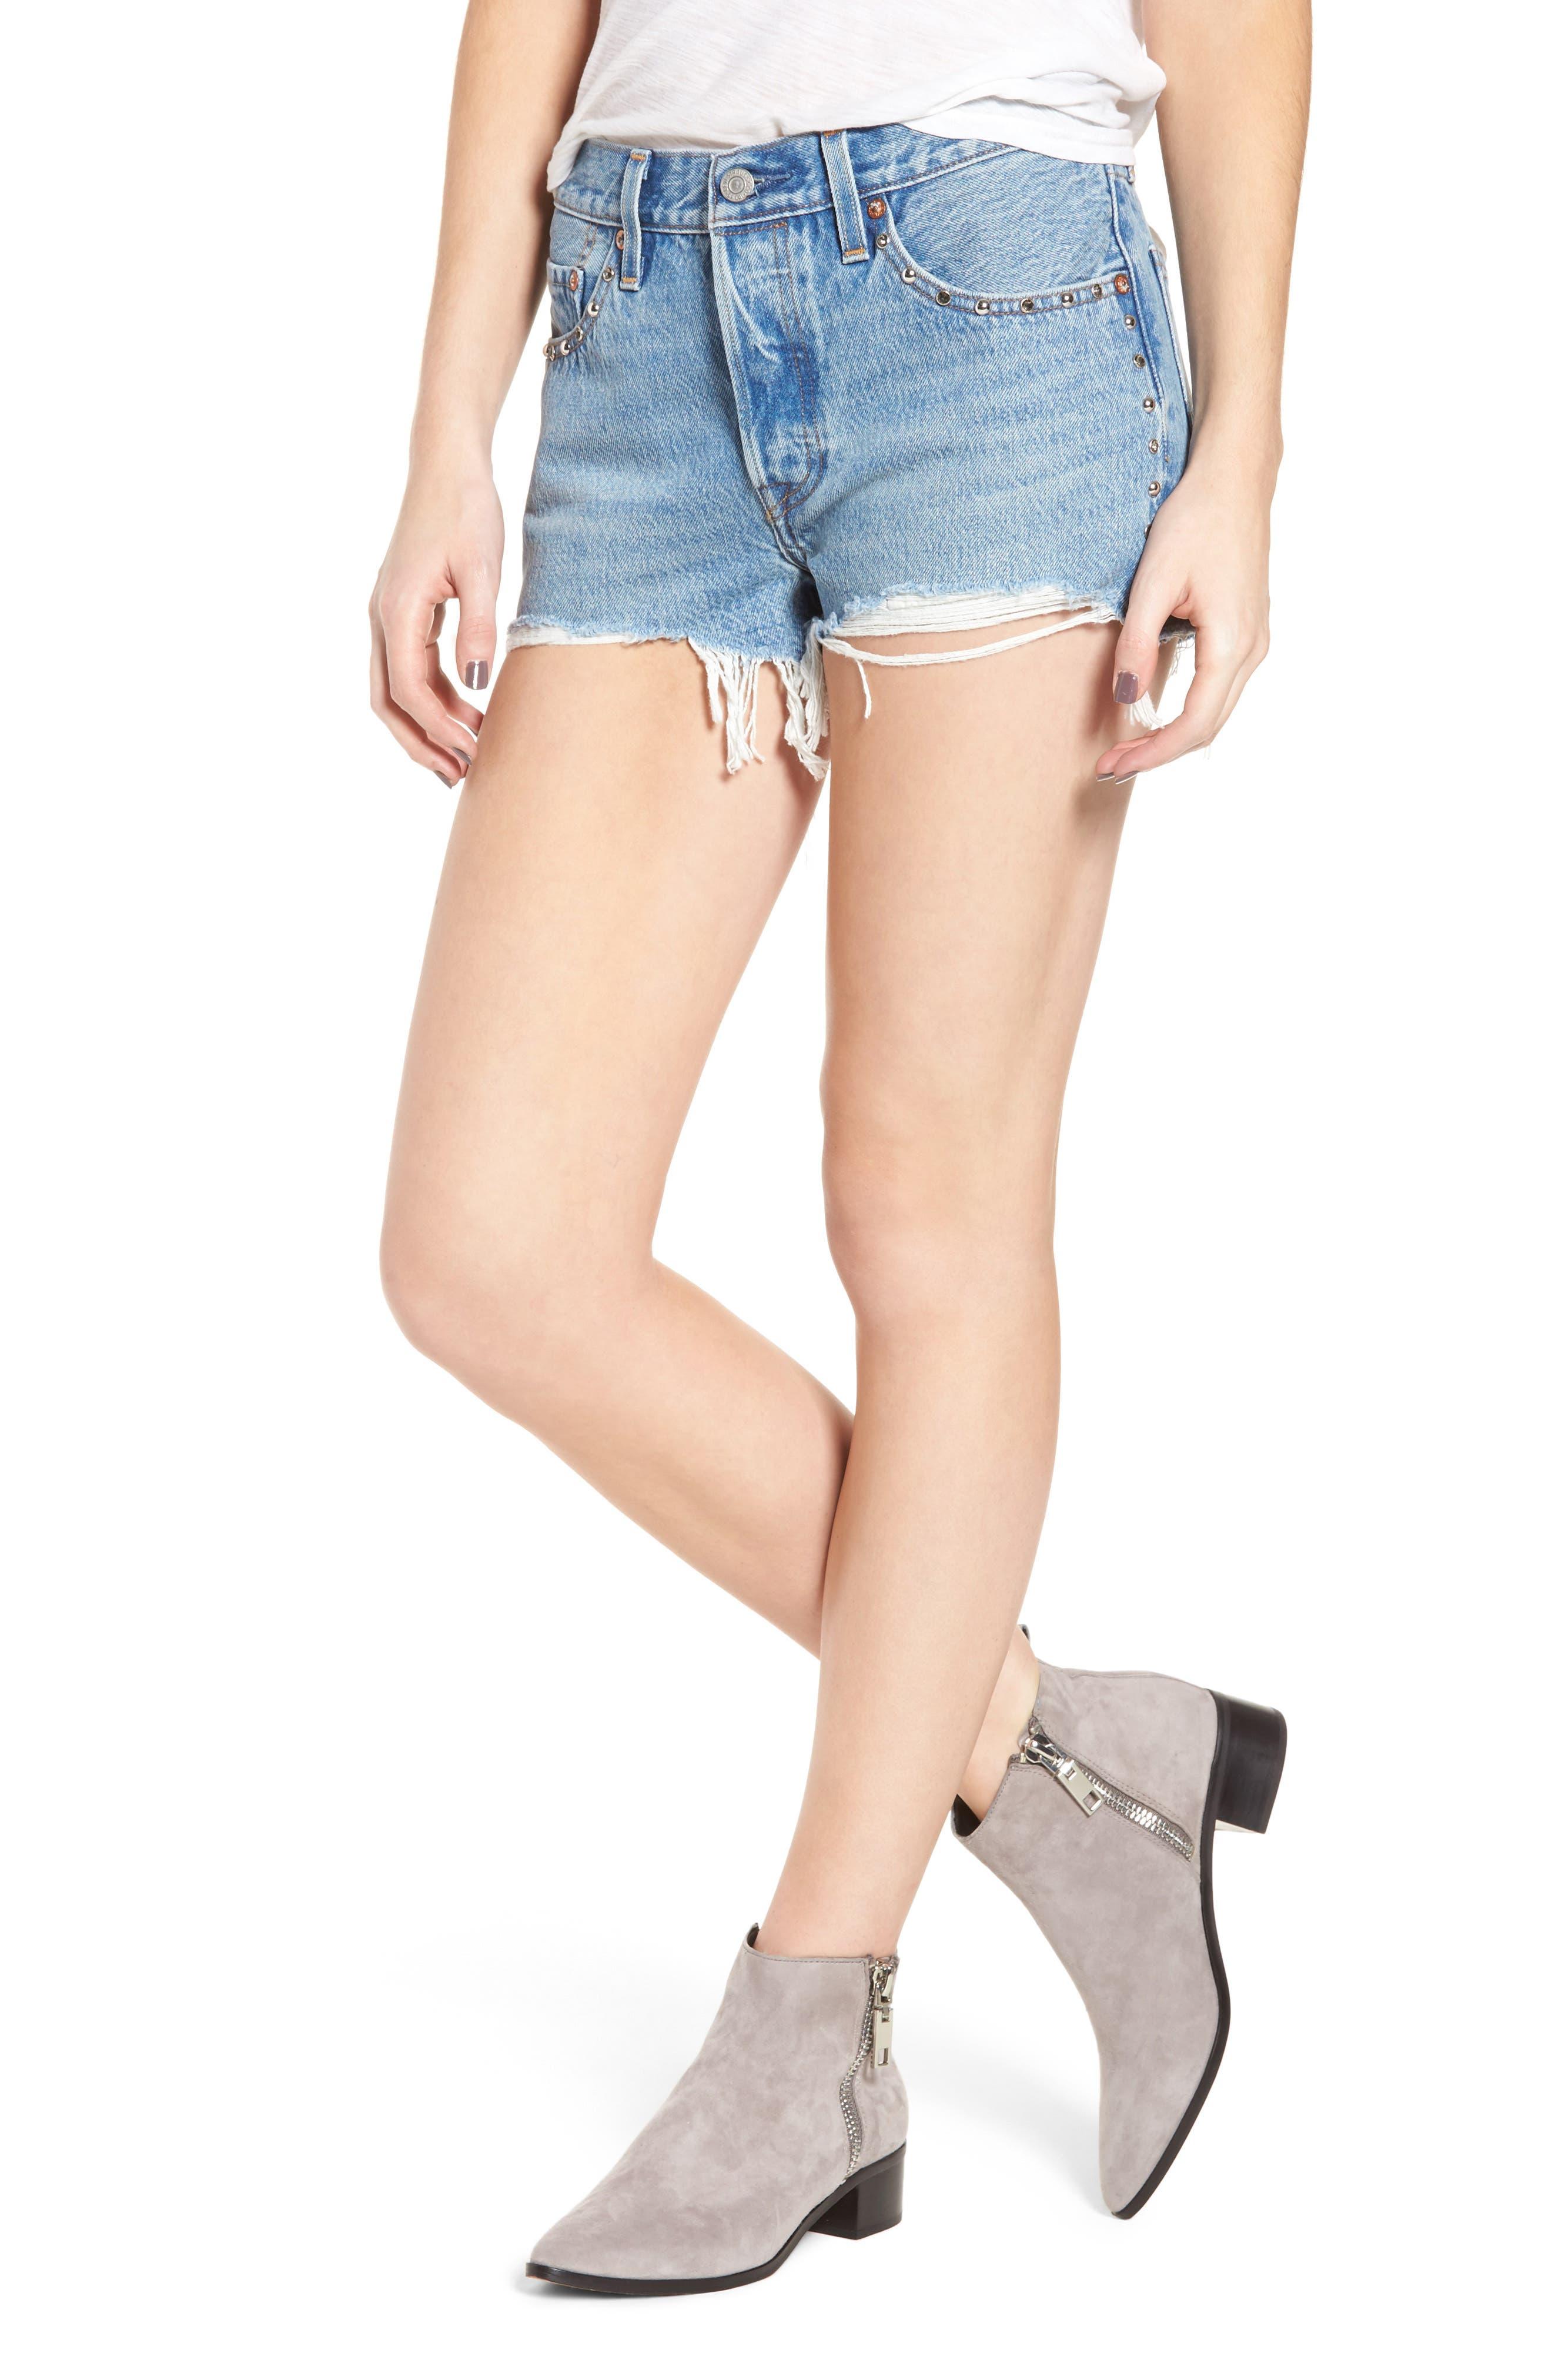 Alternate Image 1 Selected - Levi's® 501® Distressed Cutoff Denim Shorts (Hotline Bling)